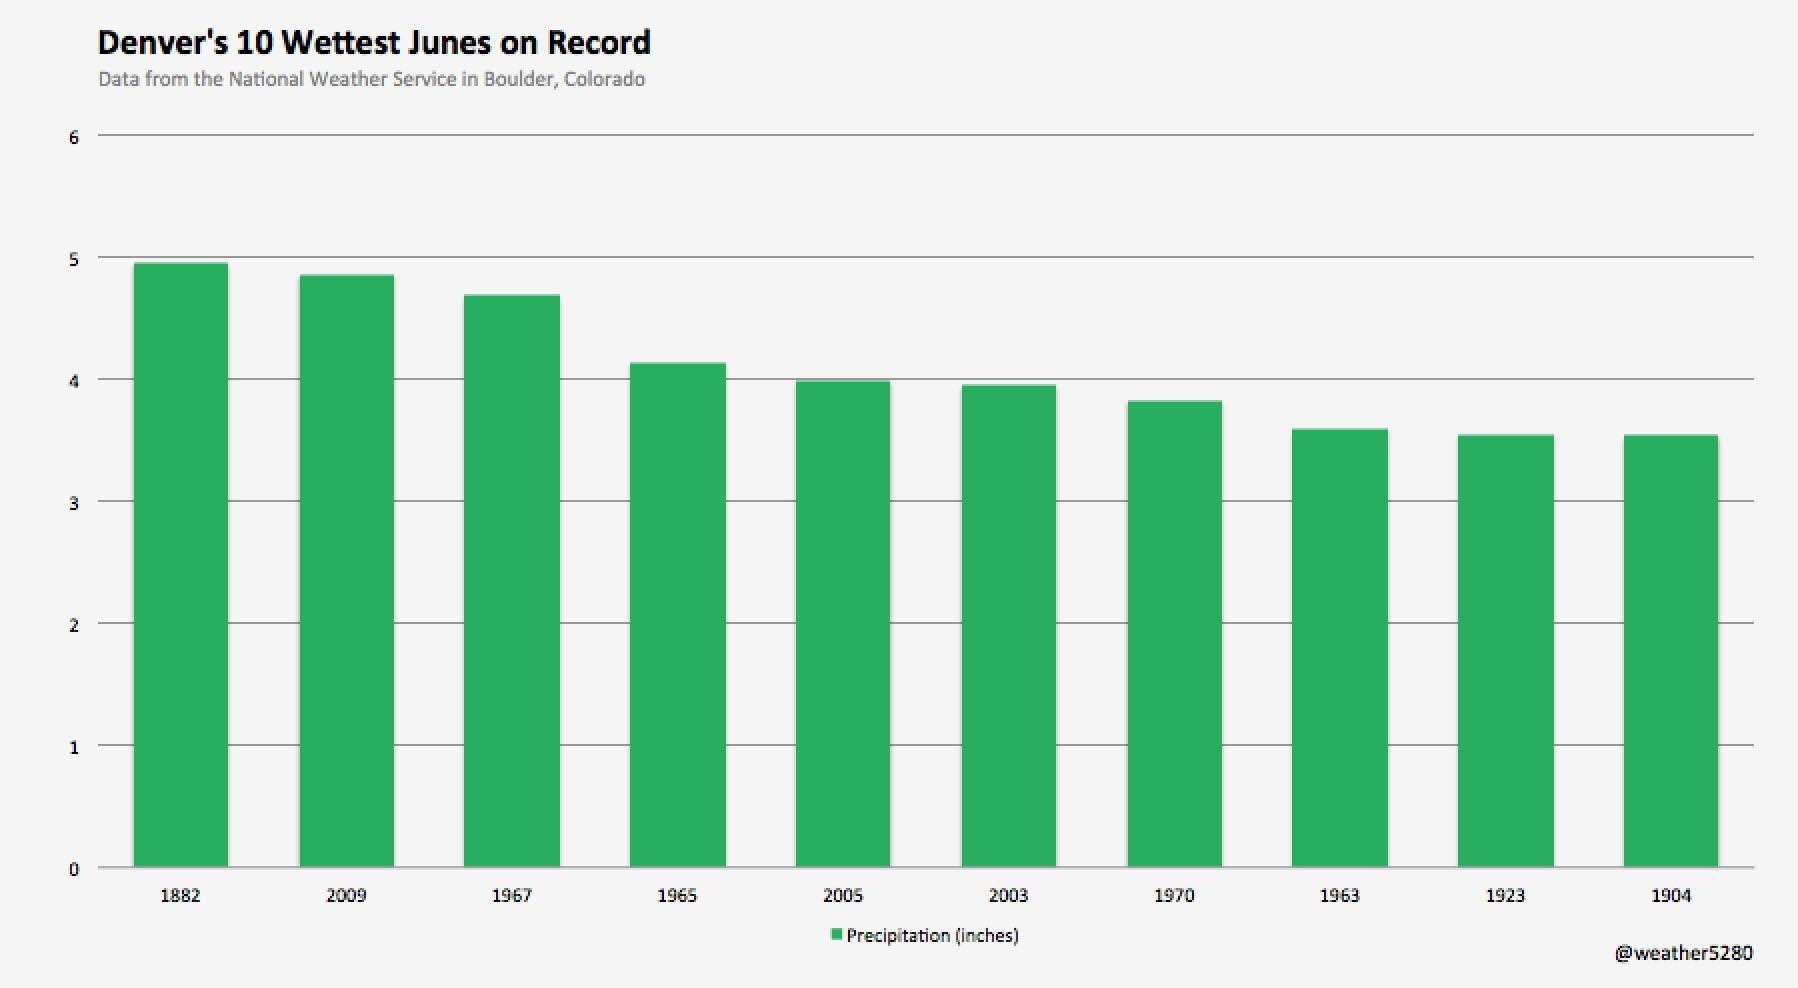 Wettest Junes on record for Denver, Colorado